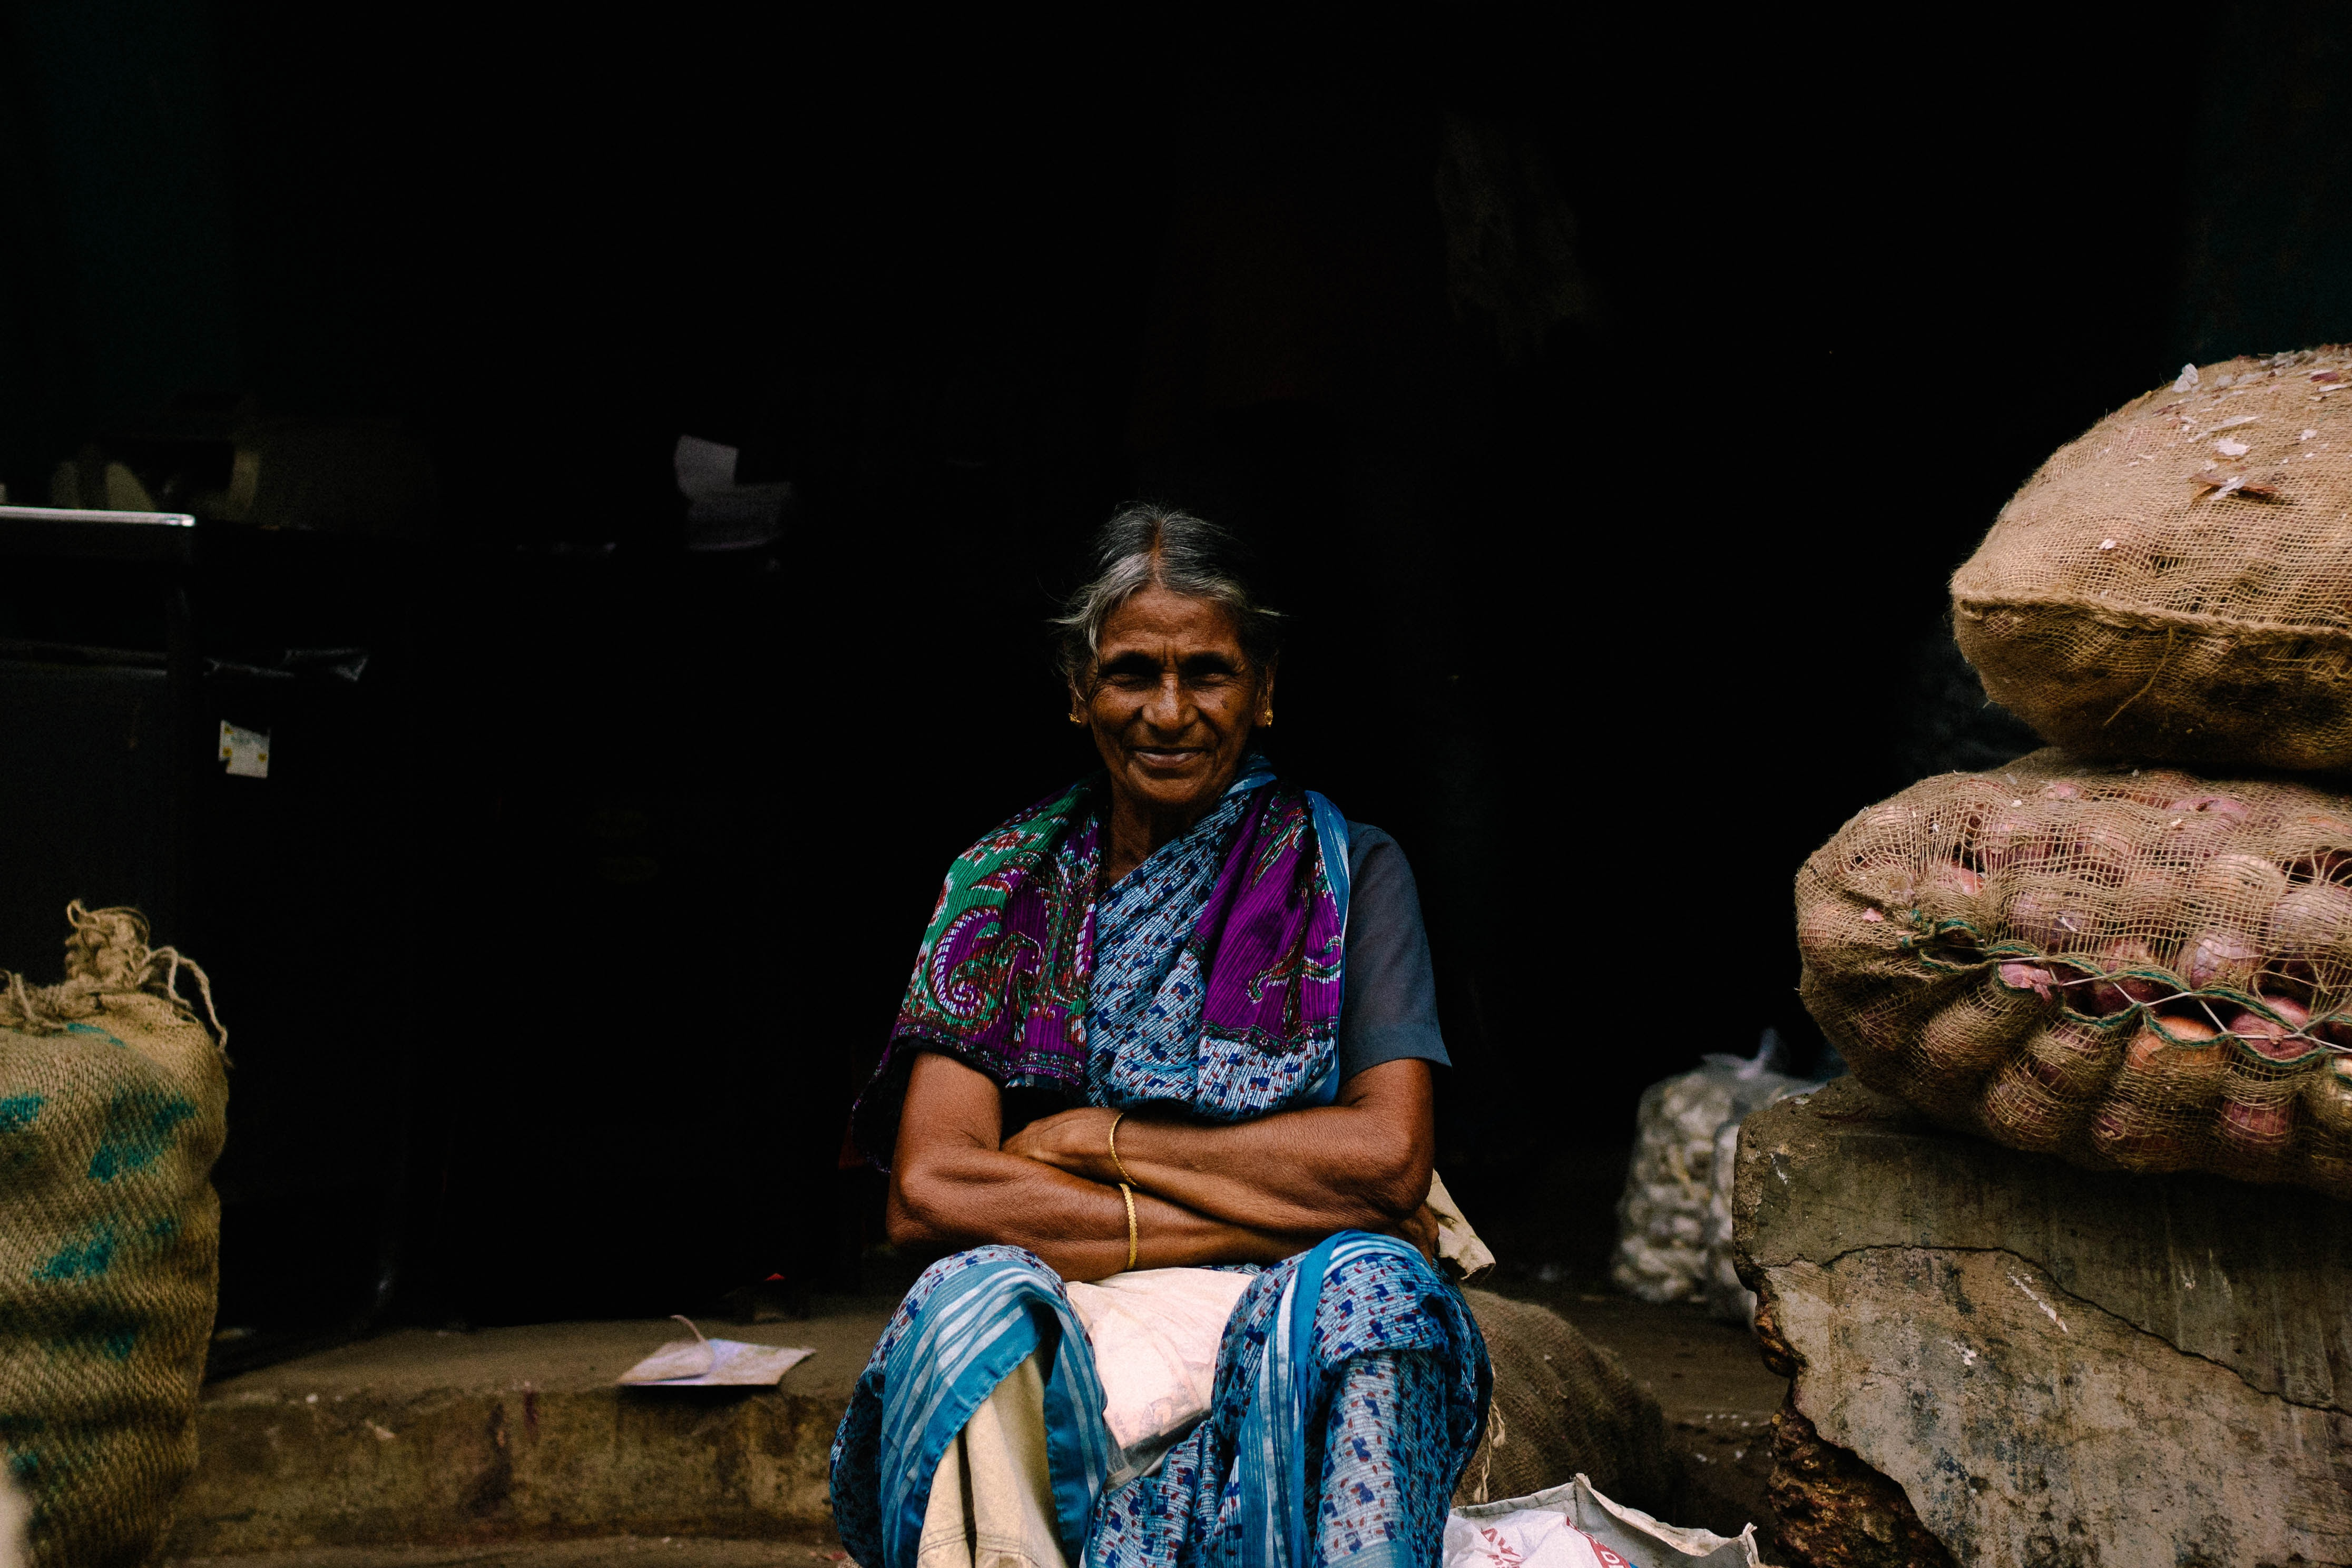 india - woman